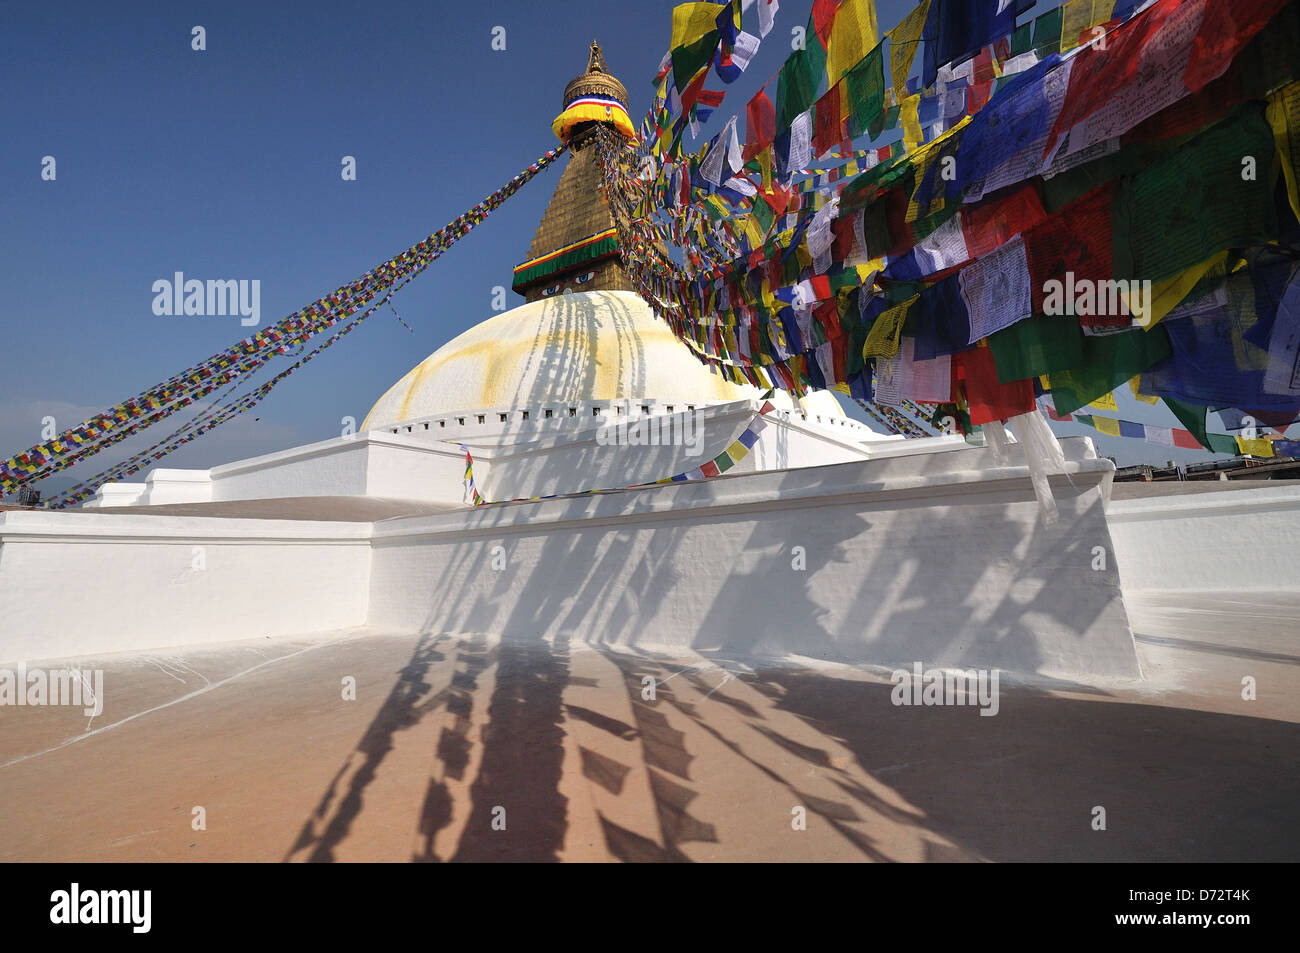 Prayer Flags at the Bodhnath Temple Kathmandu, Neapl - Stock Image